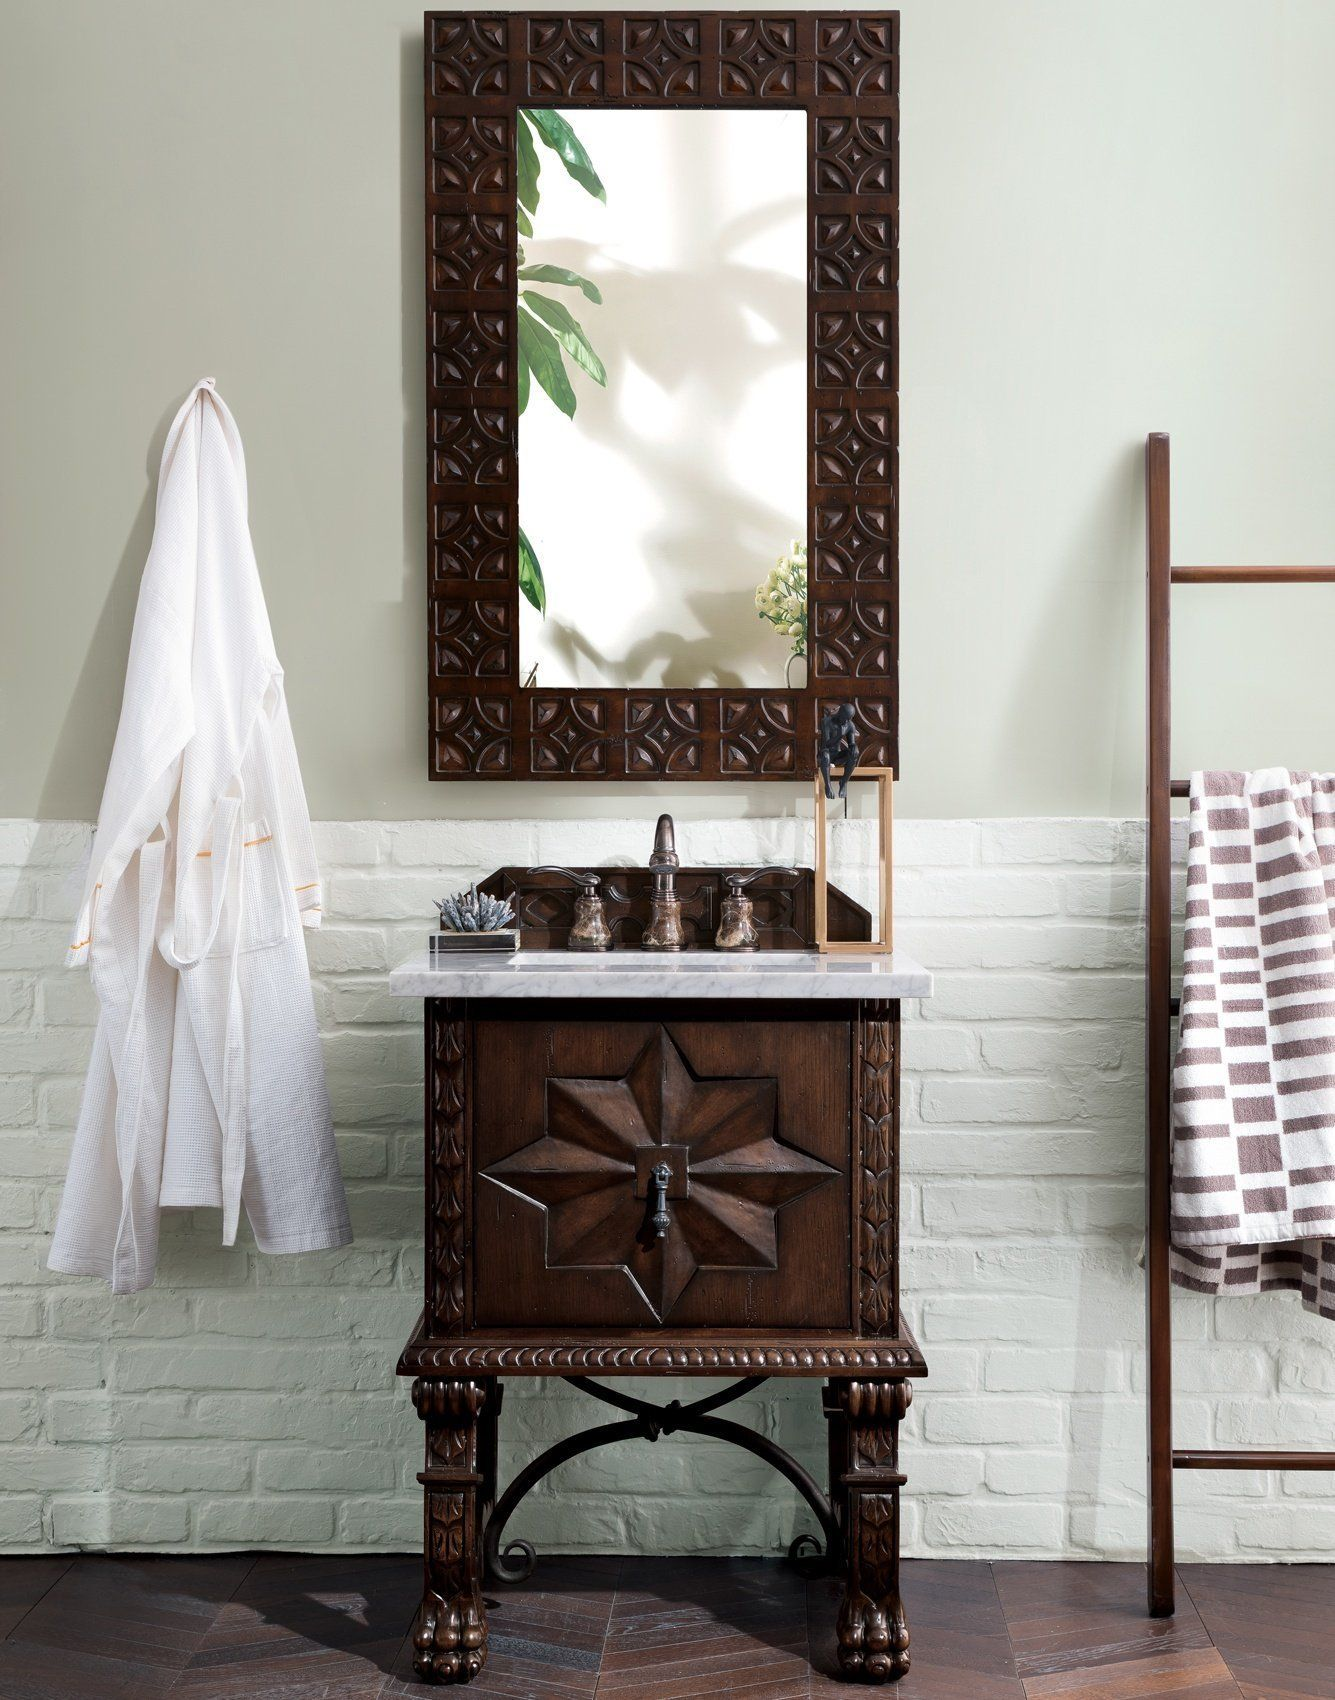 Balmoral 26 Single Bathroom Vanity Bathroom Vanity Bathroom Sink Vanity Single Bathroom Vanity